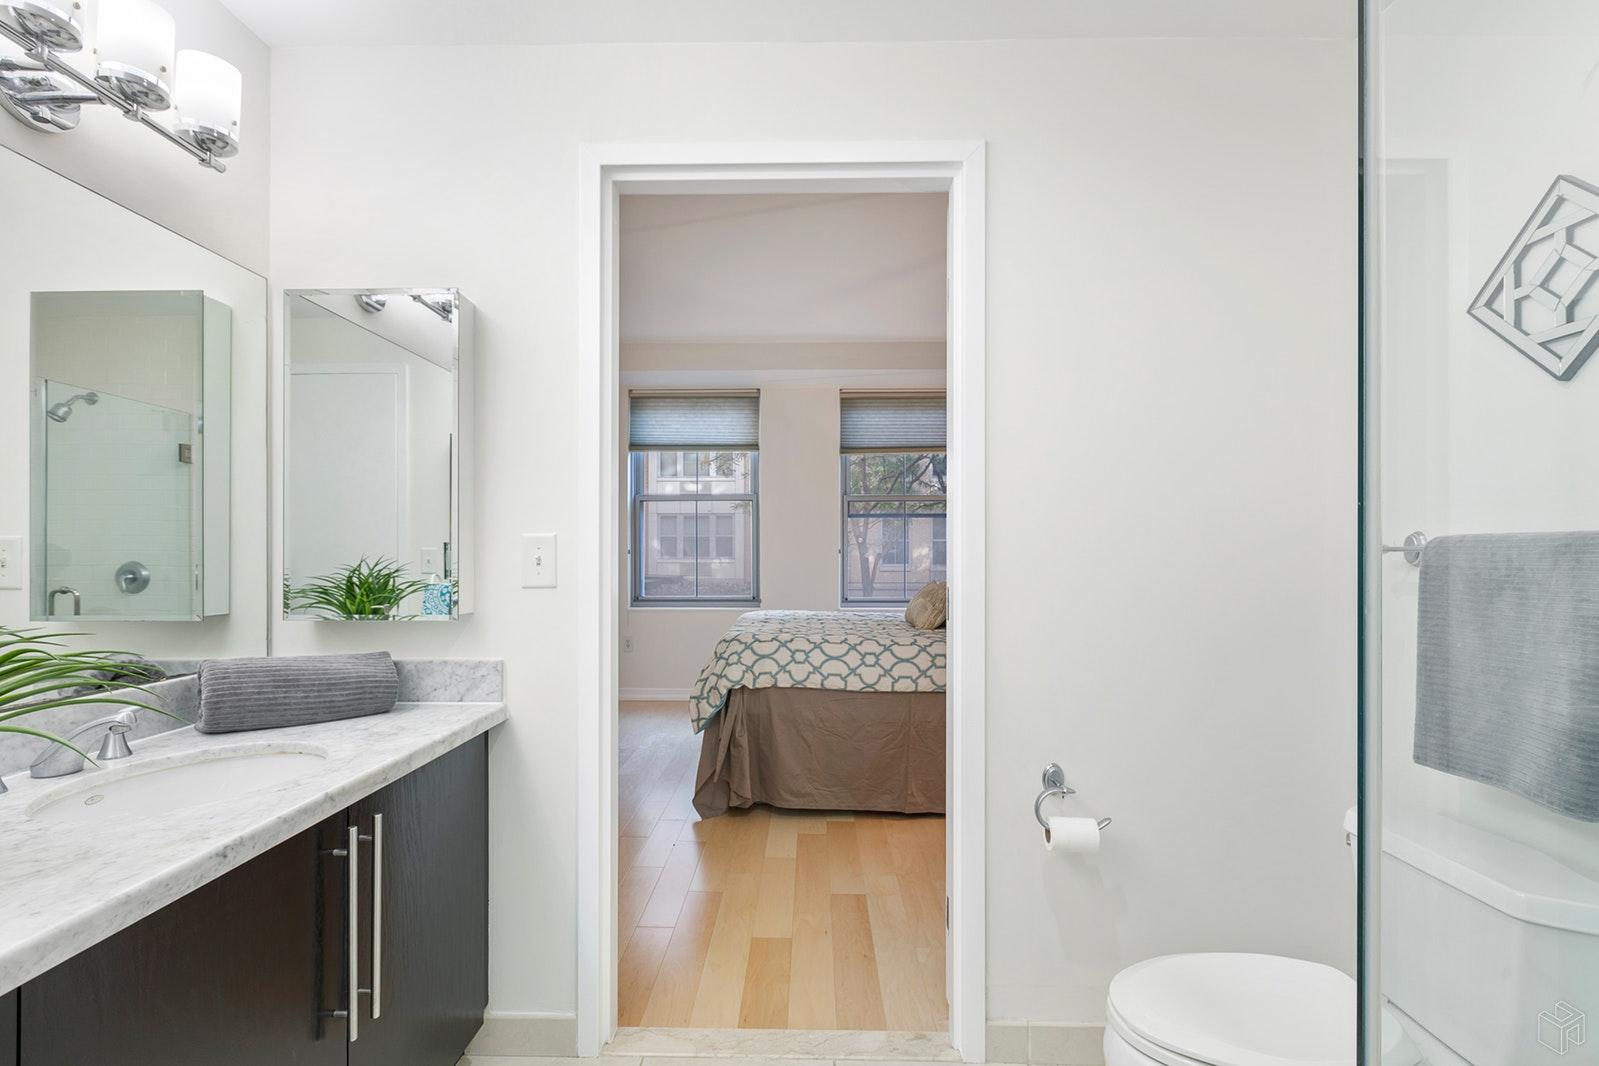 149 ESSEX ST 2L, Jersey City Downtown, $769,000, Web #: 19138989